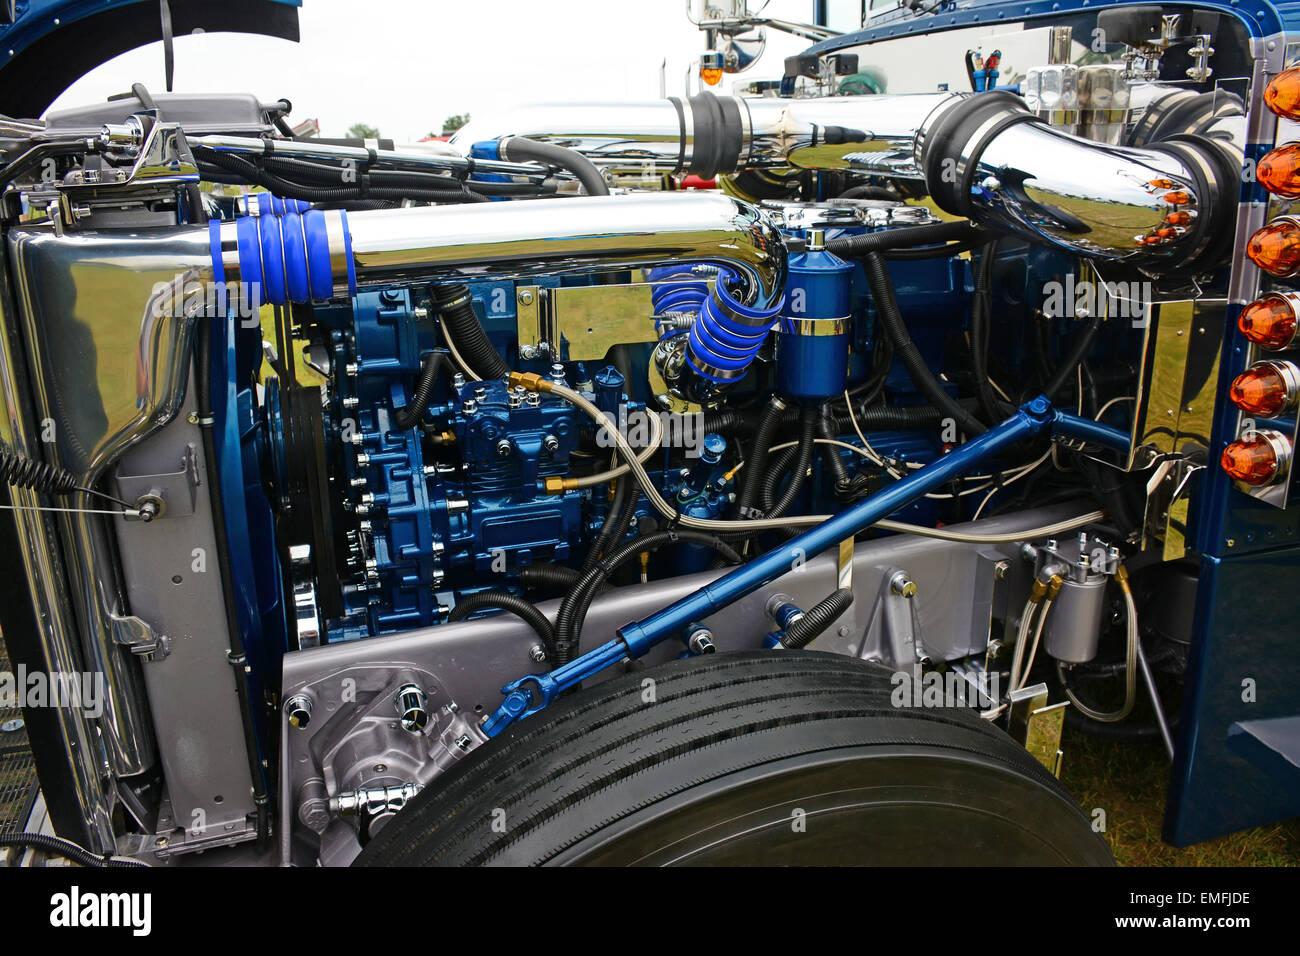 Truck engine - Stock Image